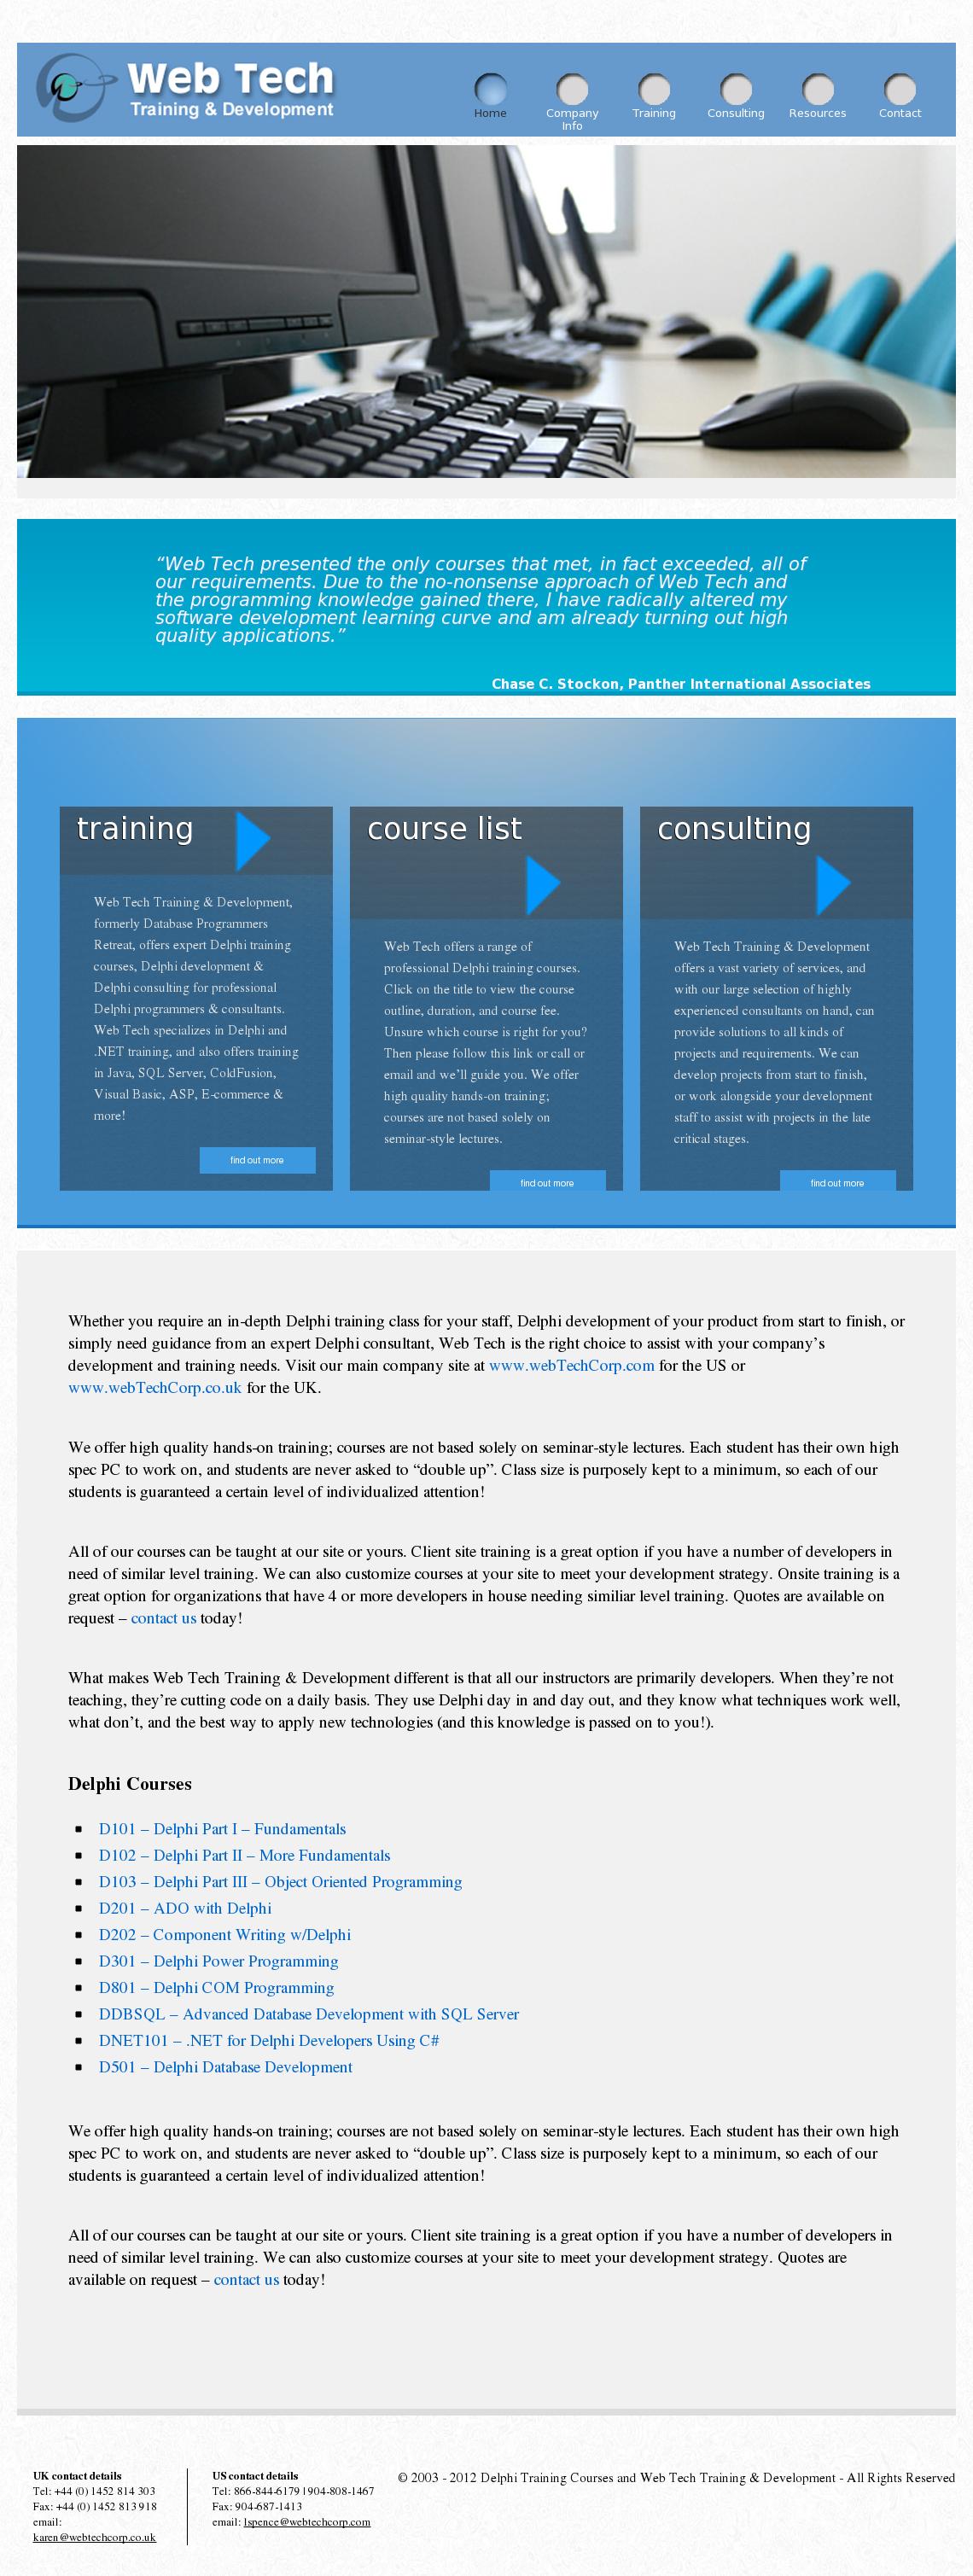 Delphi Training Courses And Web Tech Training & Development